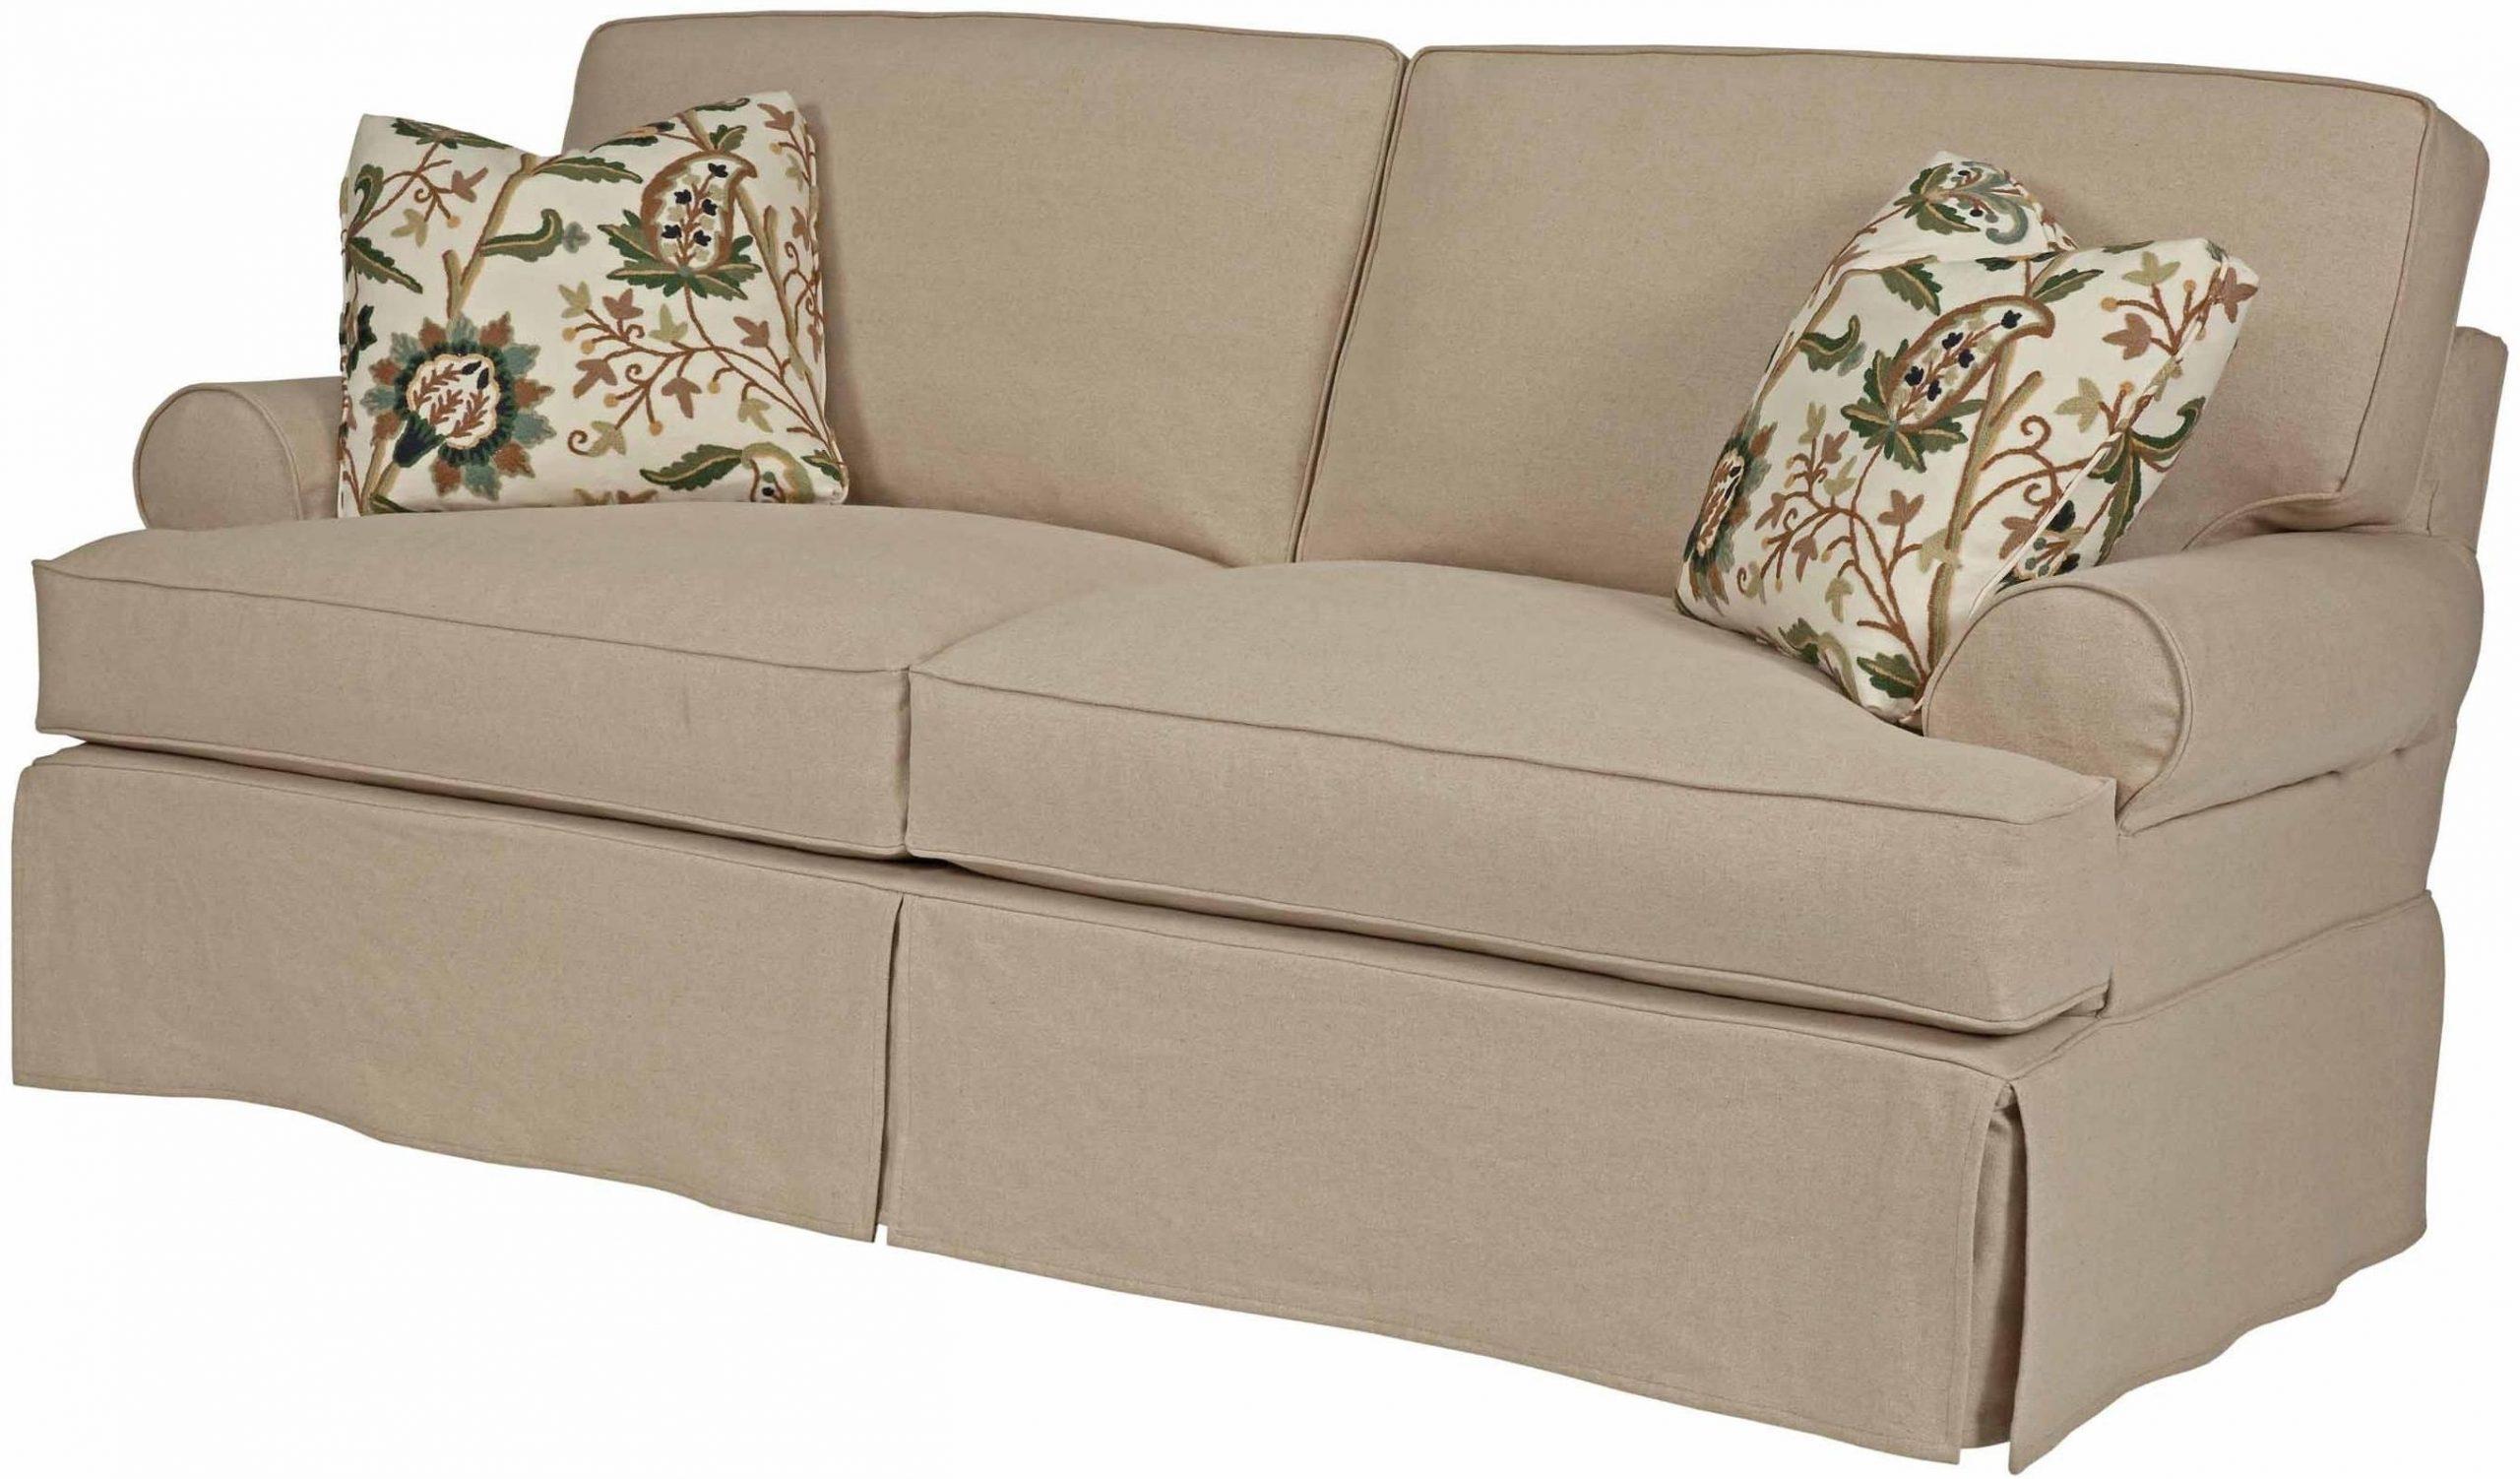 Sofa Slipcover Ideas